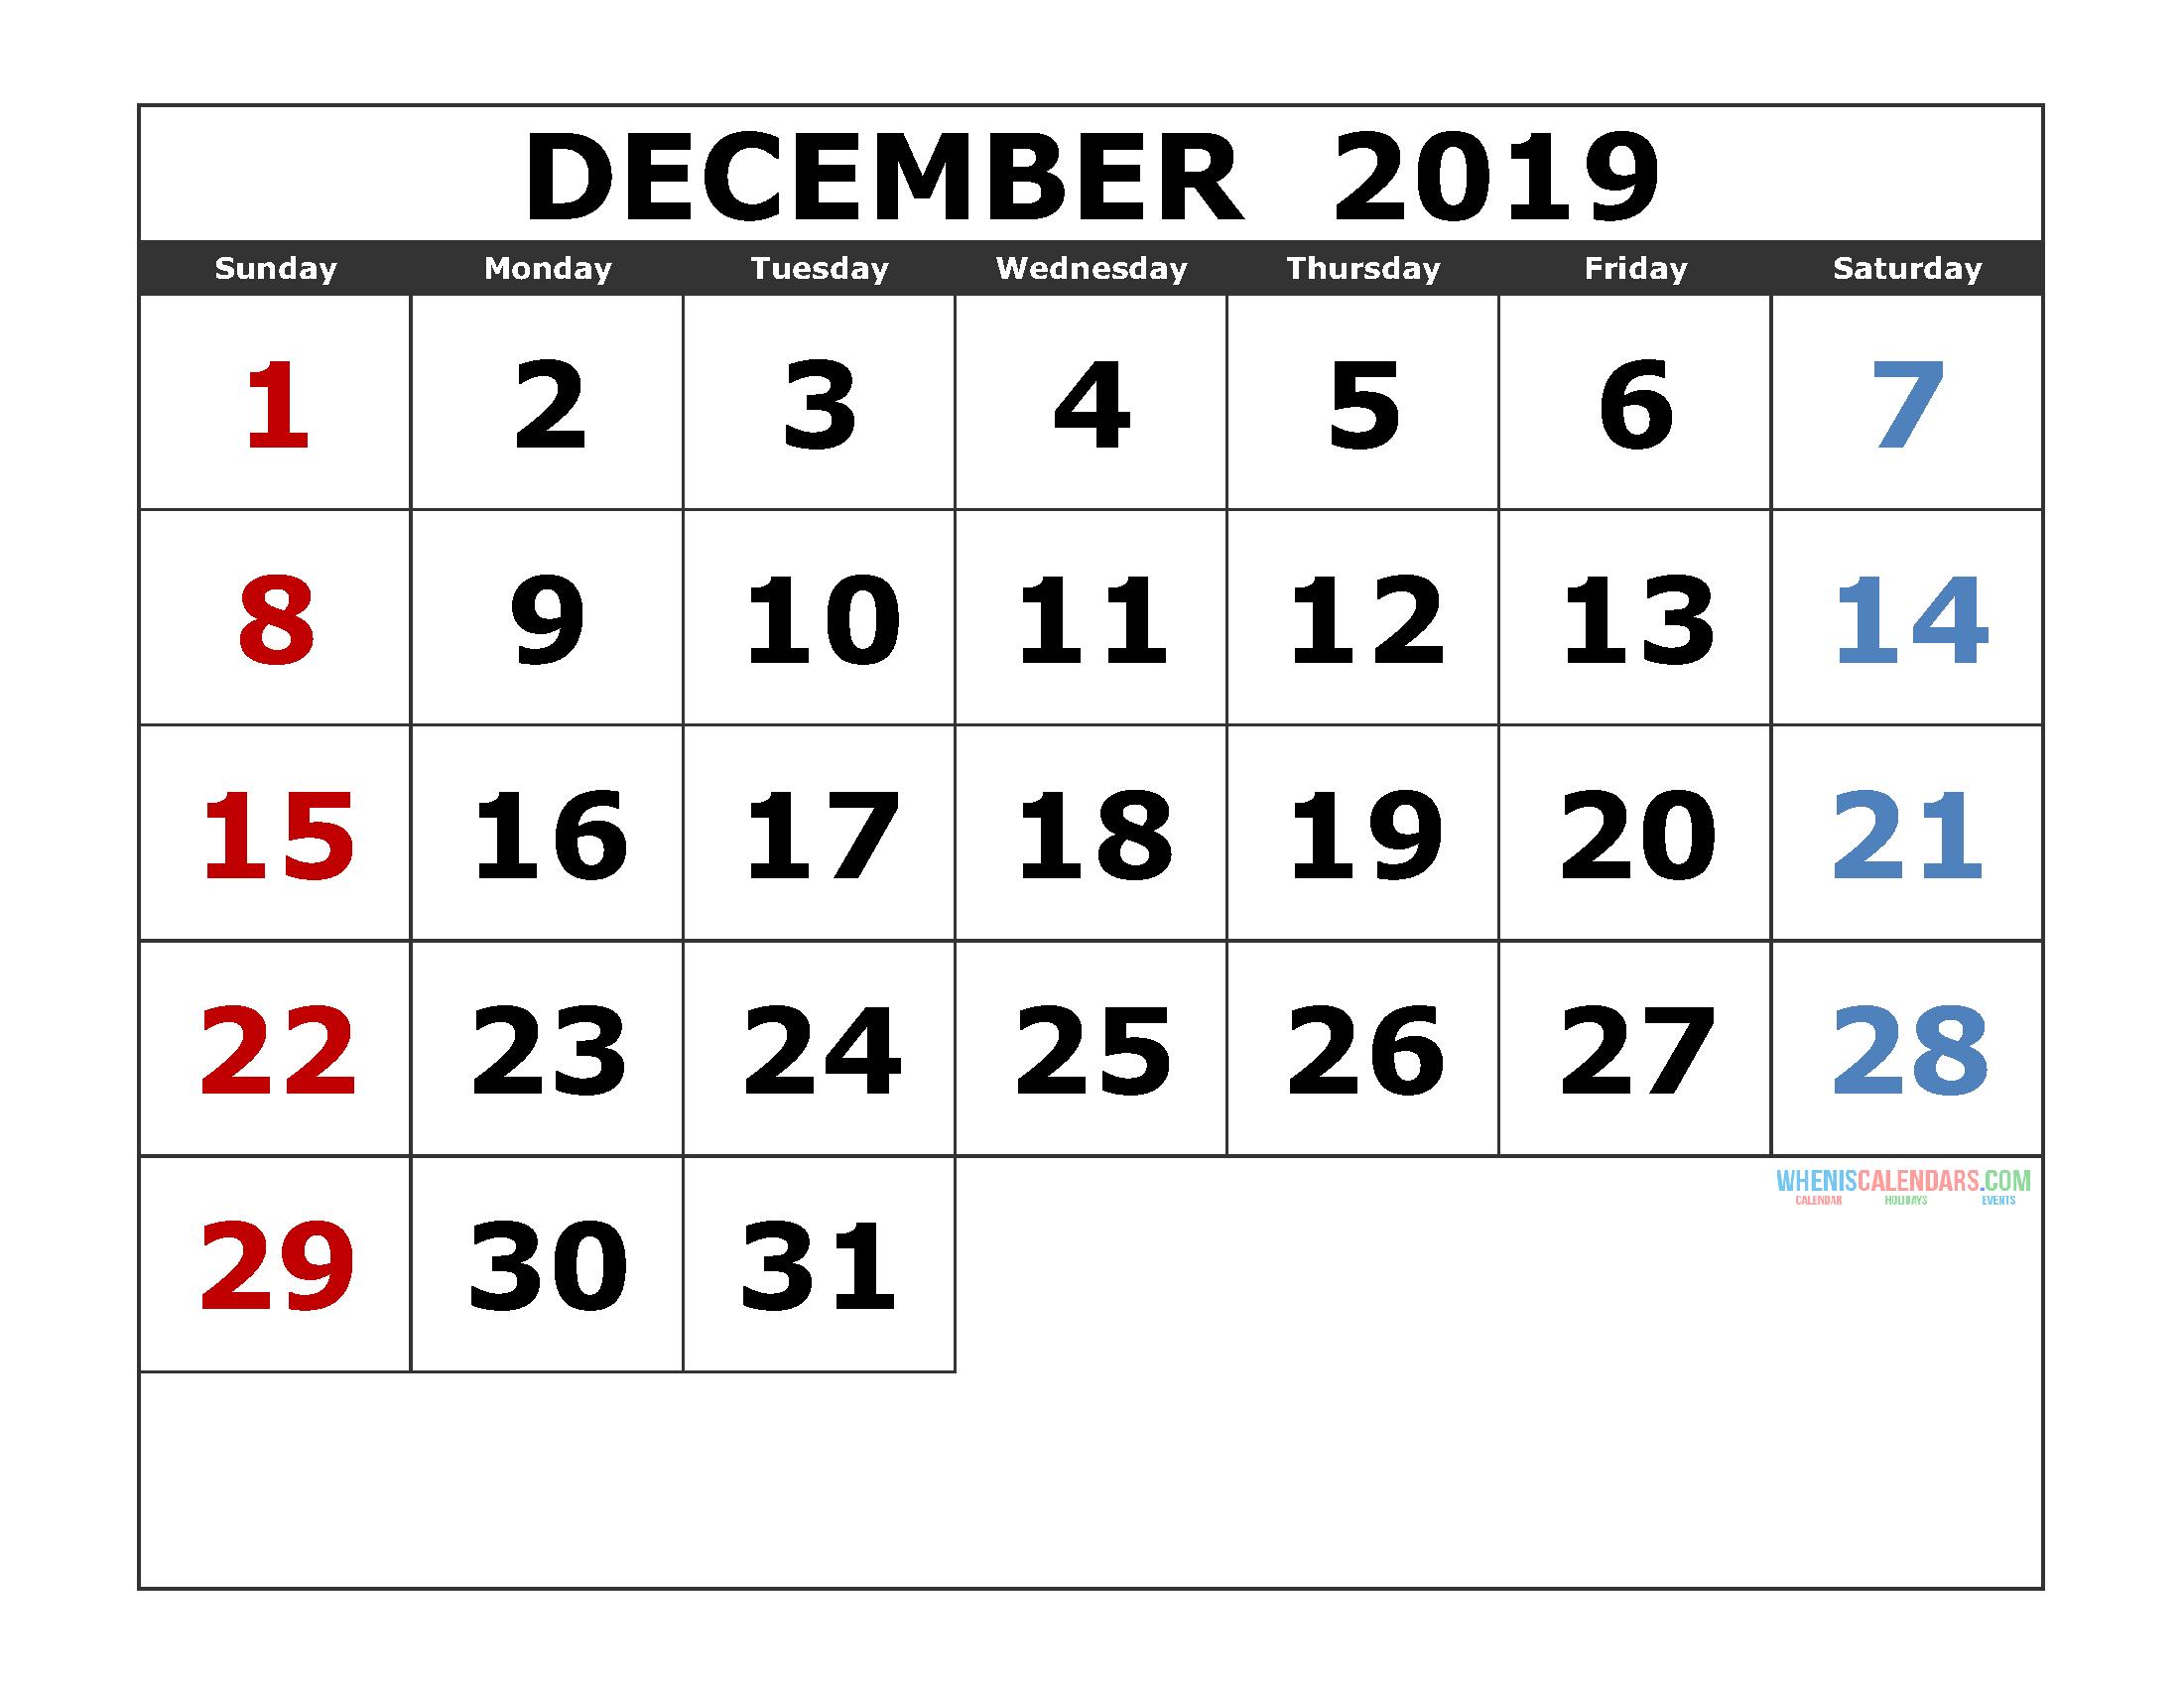 Calendar For December 2019 Dec December December2019 December2019calendar 2019calendar Monthly Calendar Template Print Calendar Monthly Calendar Printable